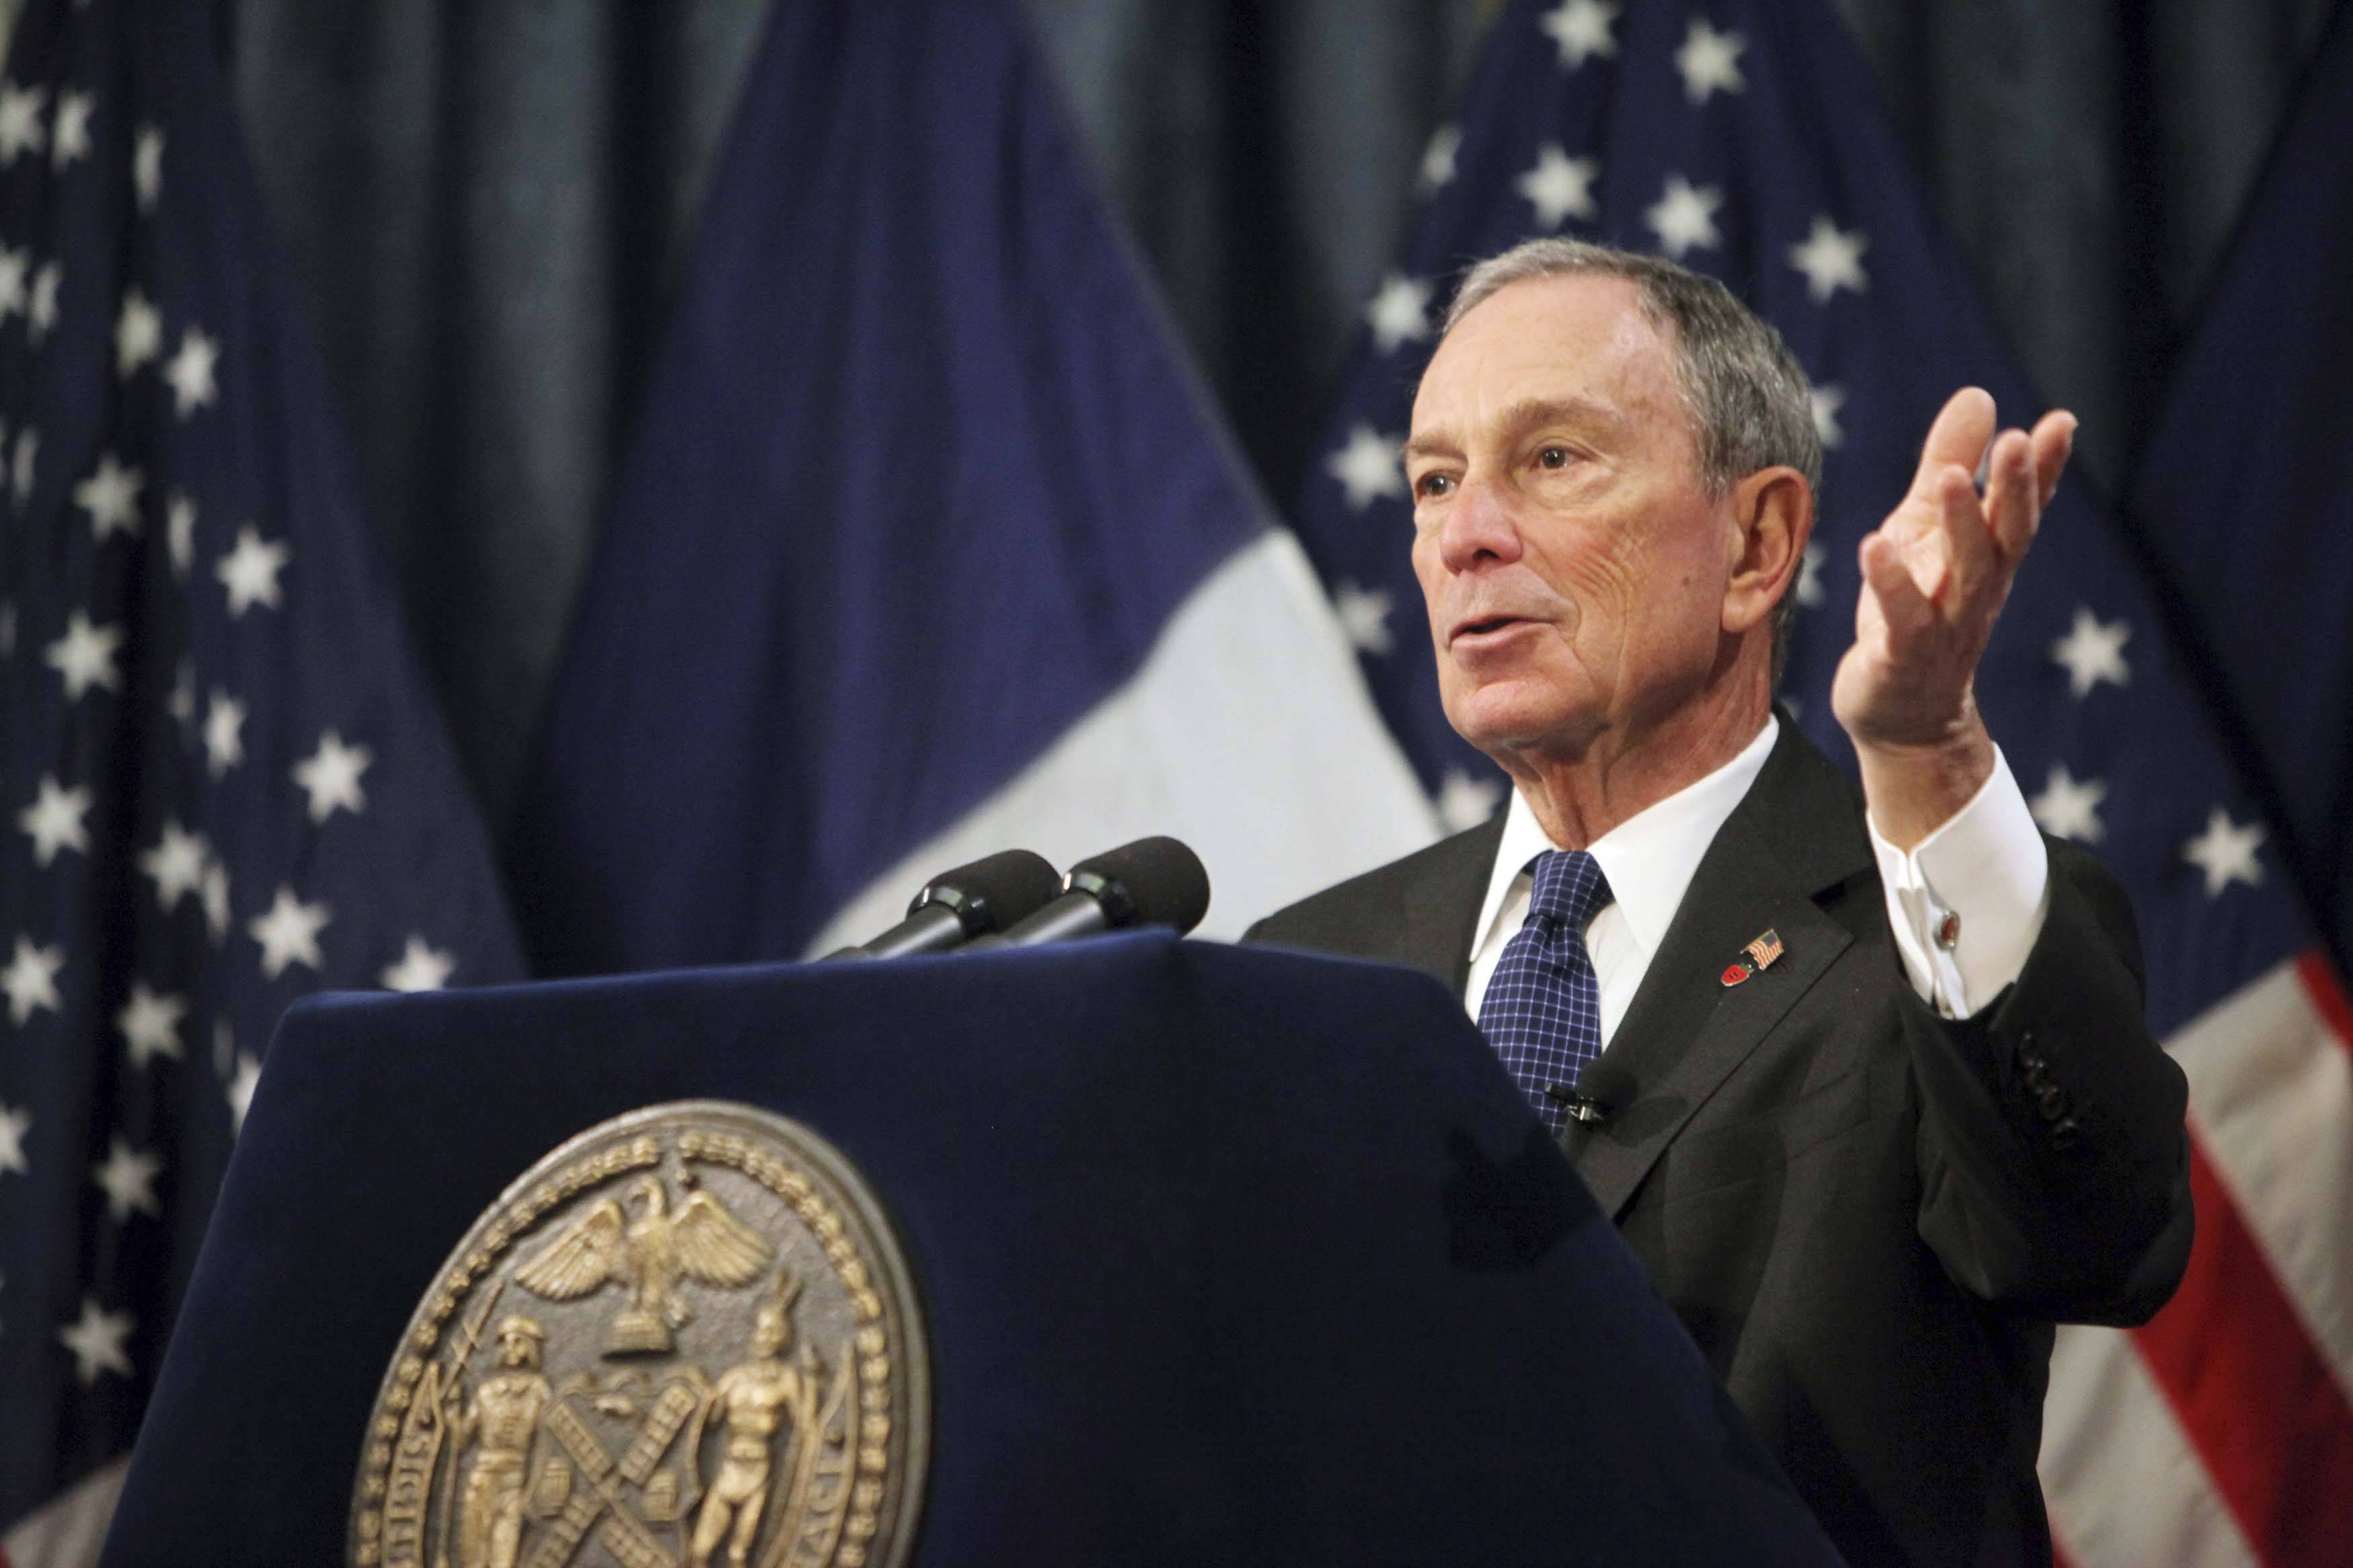 New York mayor Michael Bloomberg unveils budget in New York